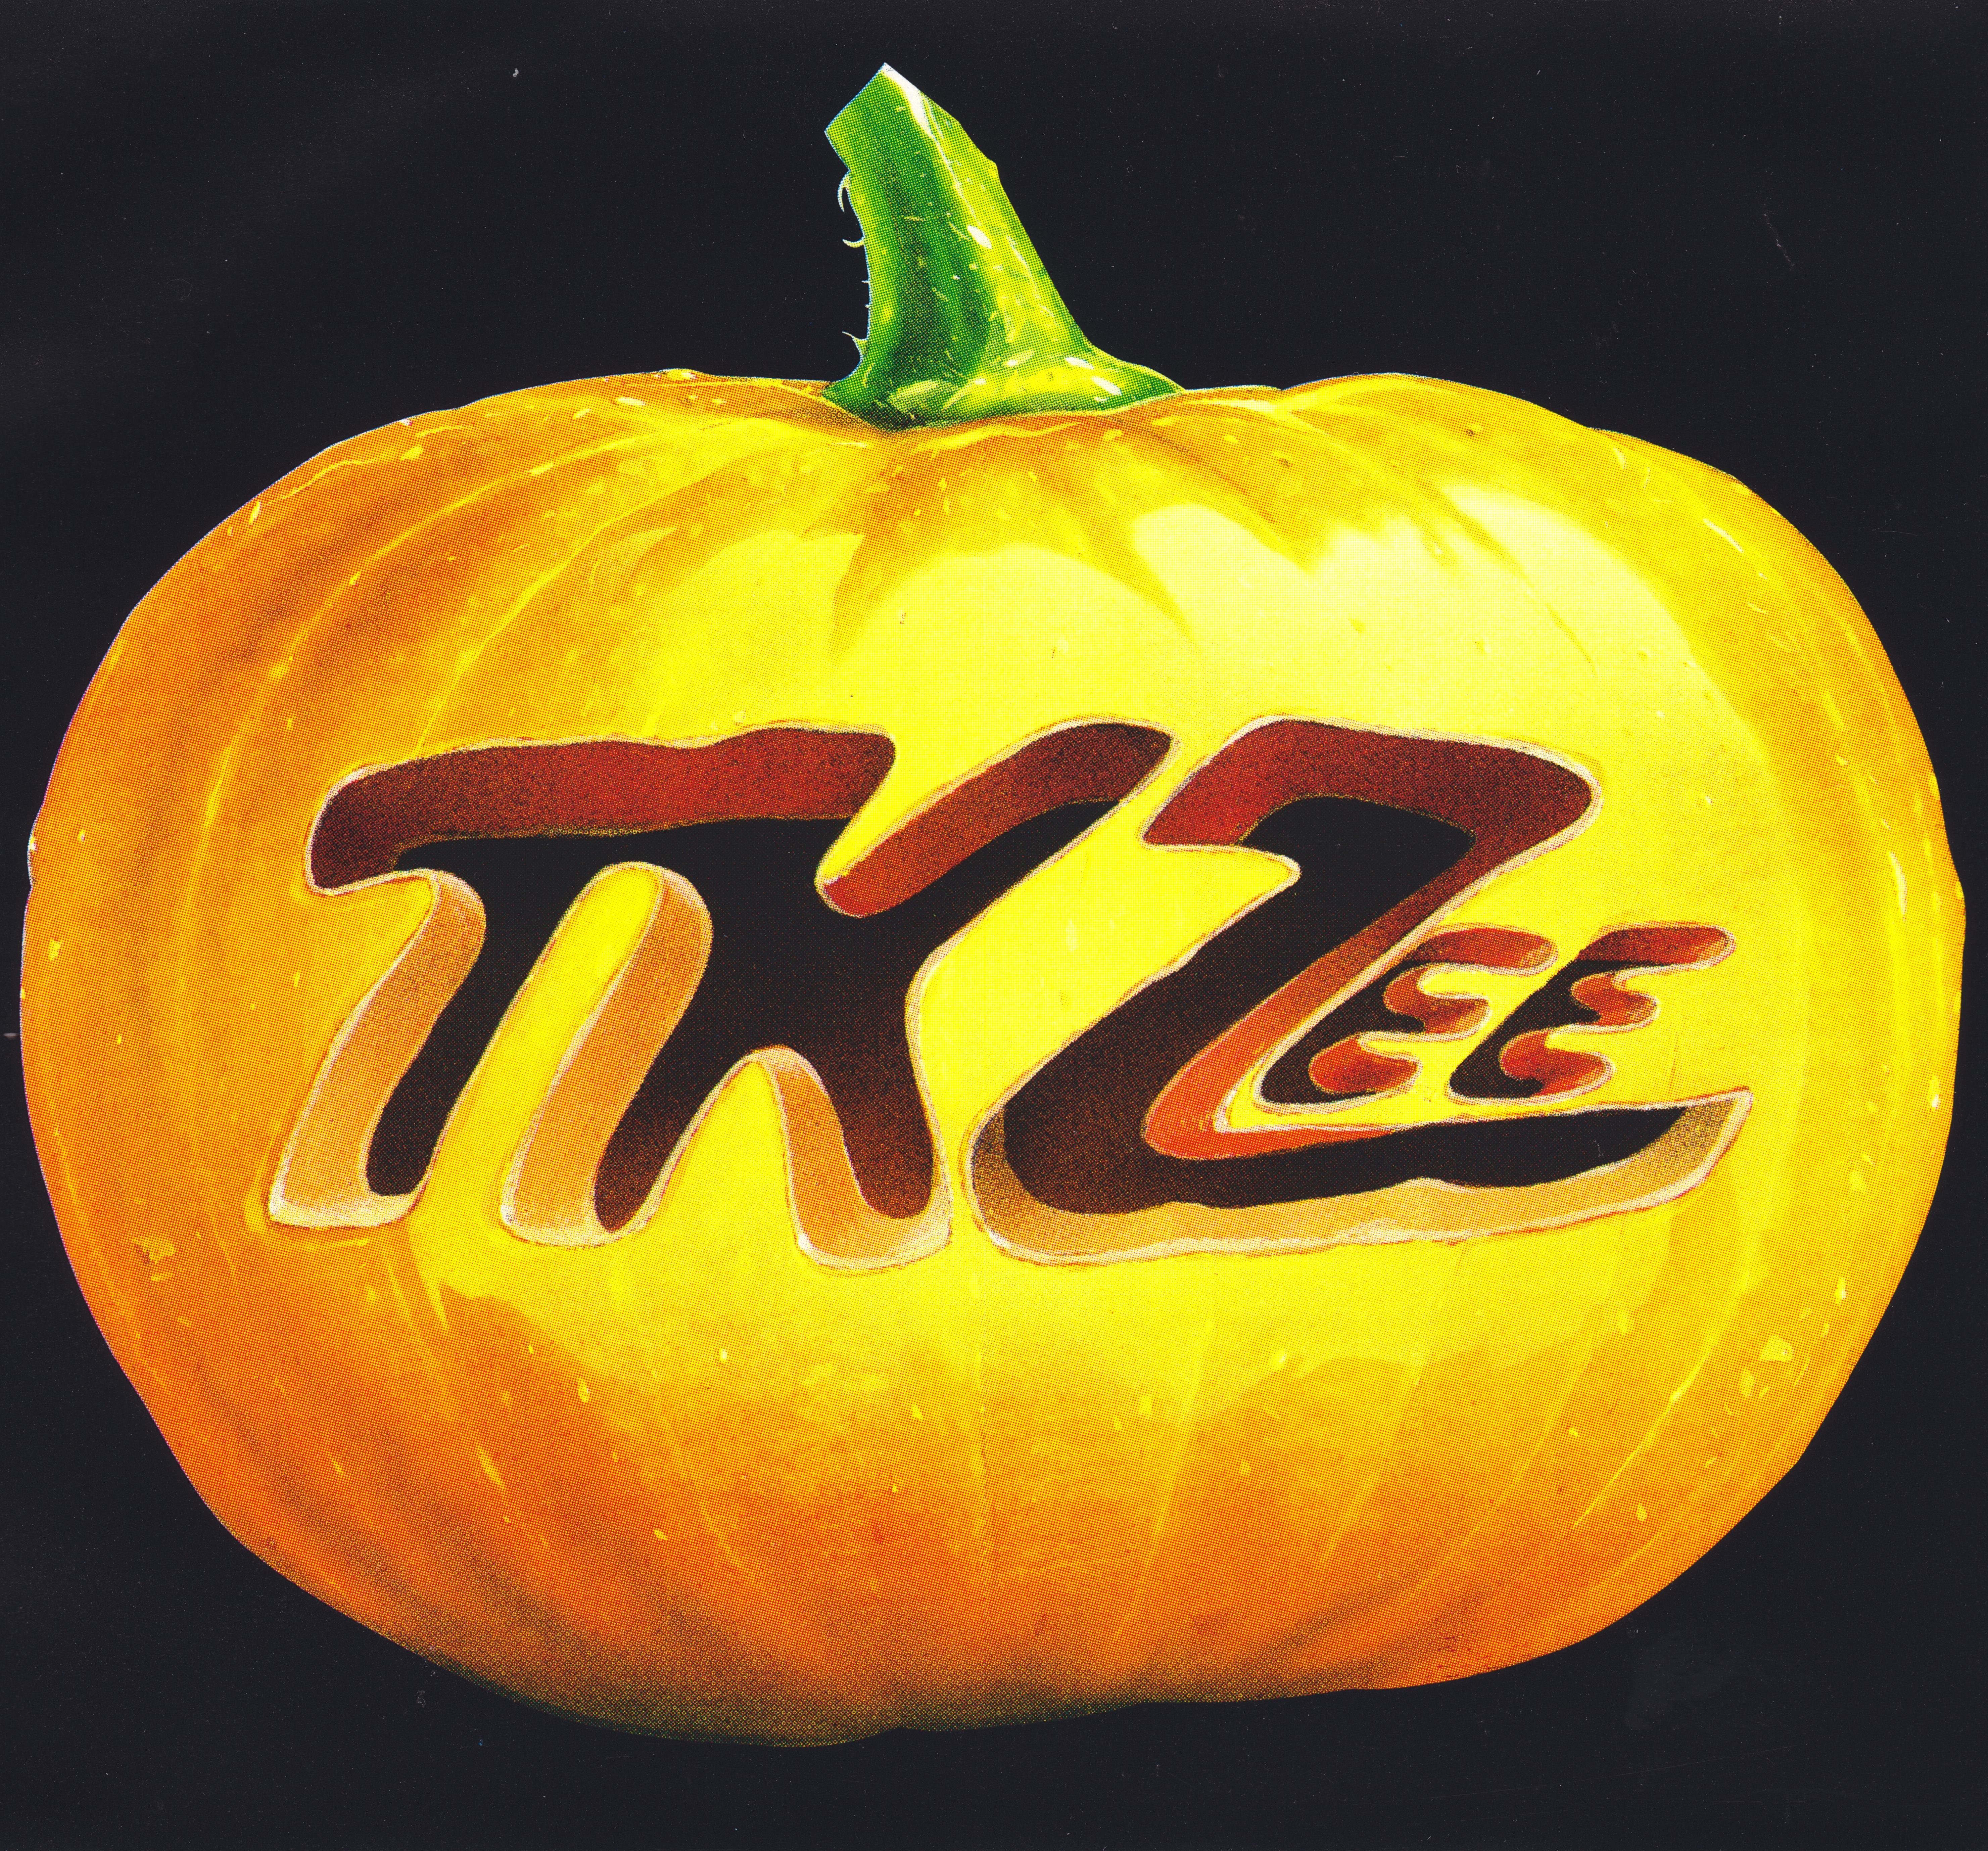 Darkpopchris-TKZee-HalloweenPumpkin